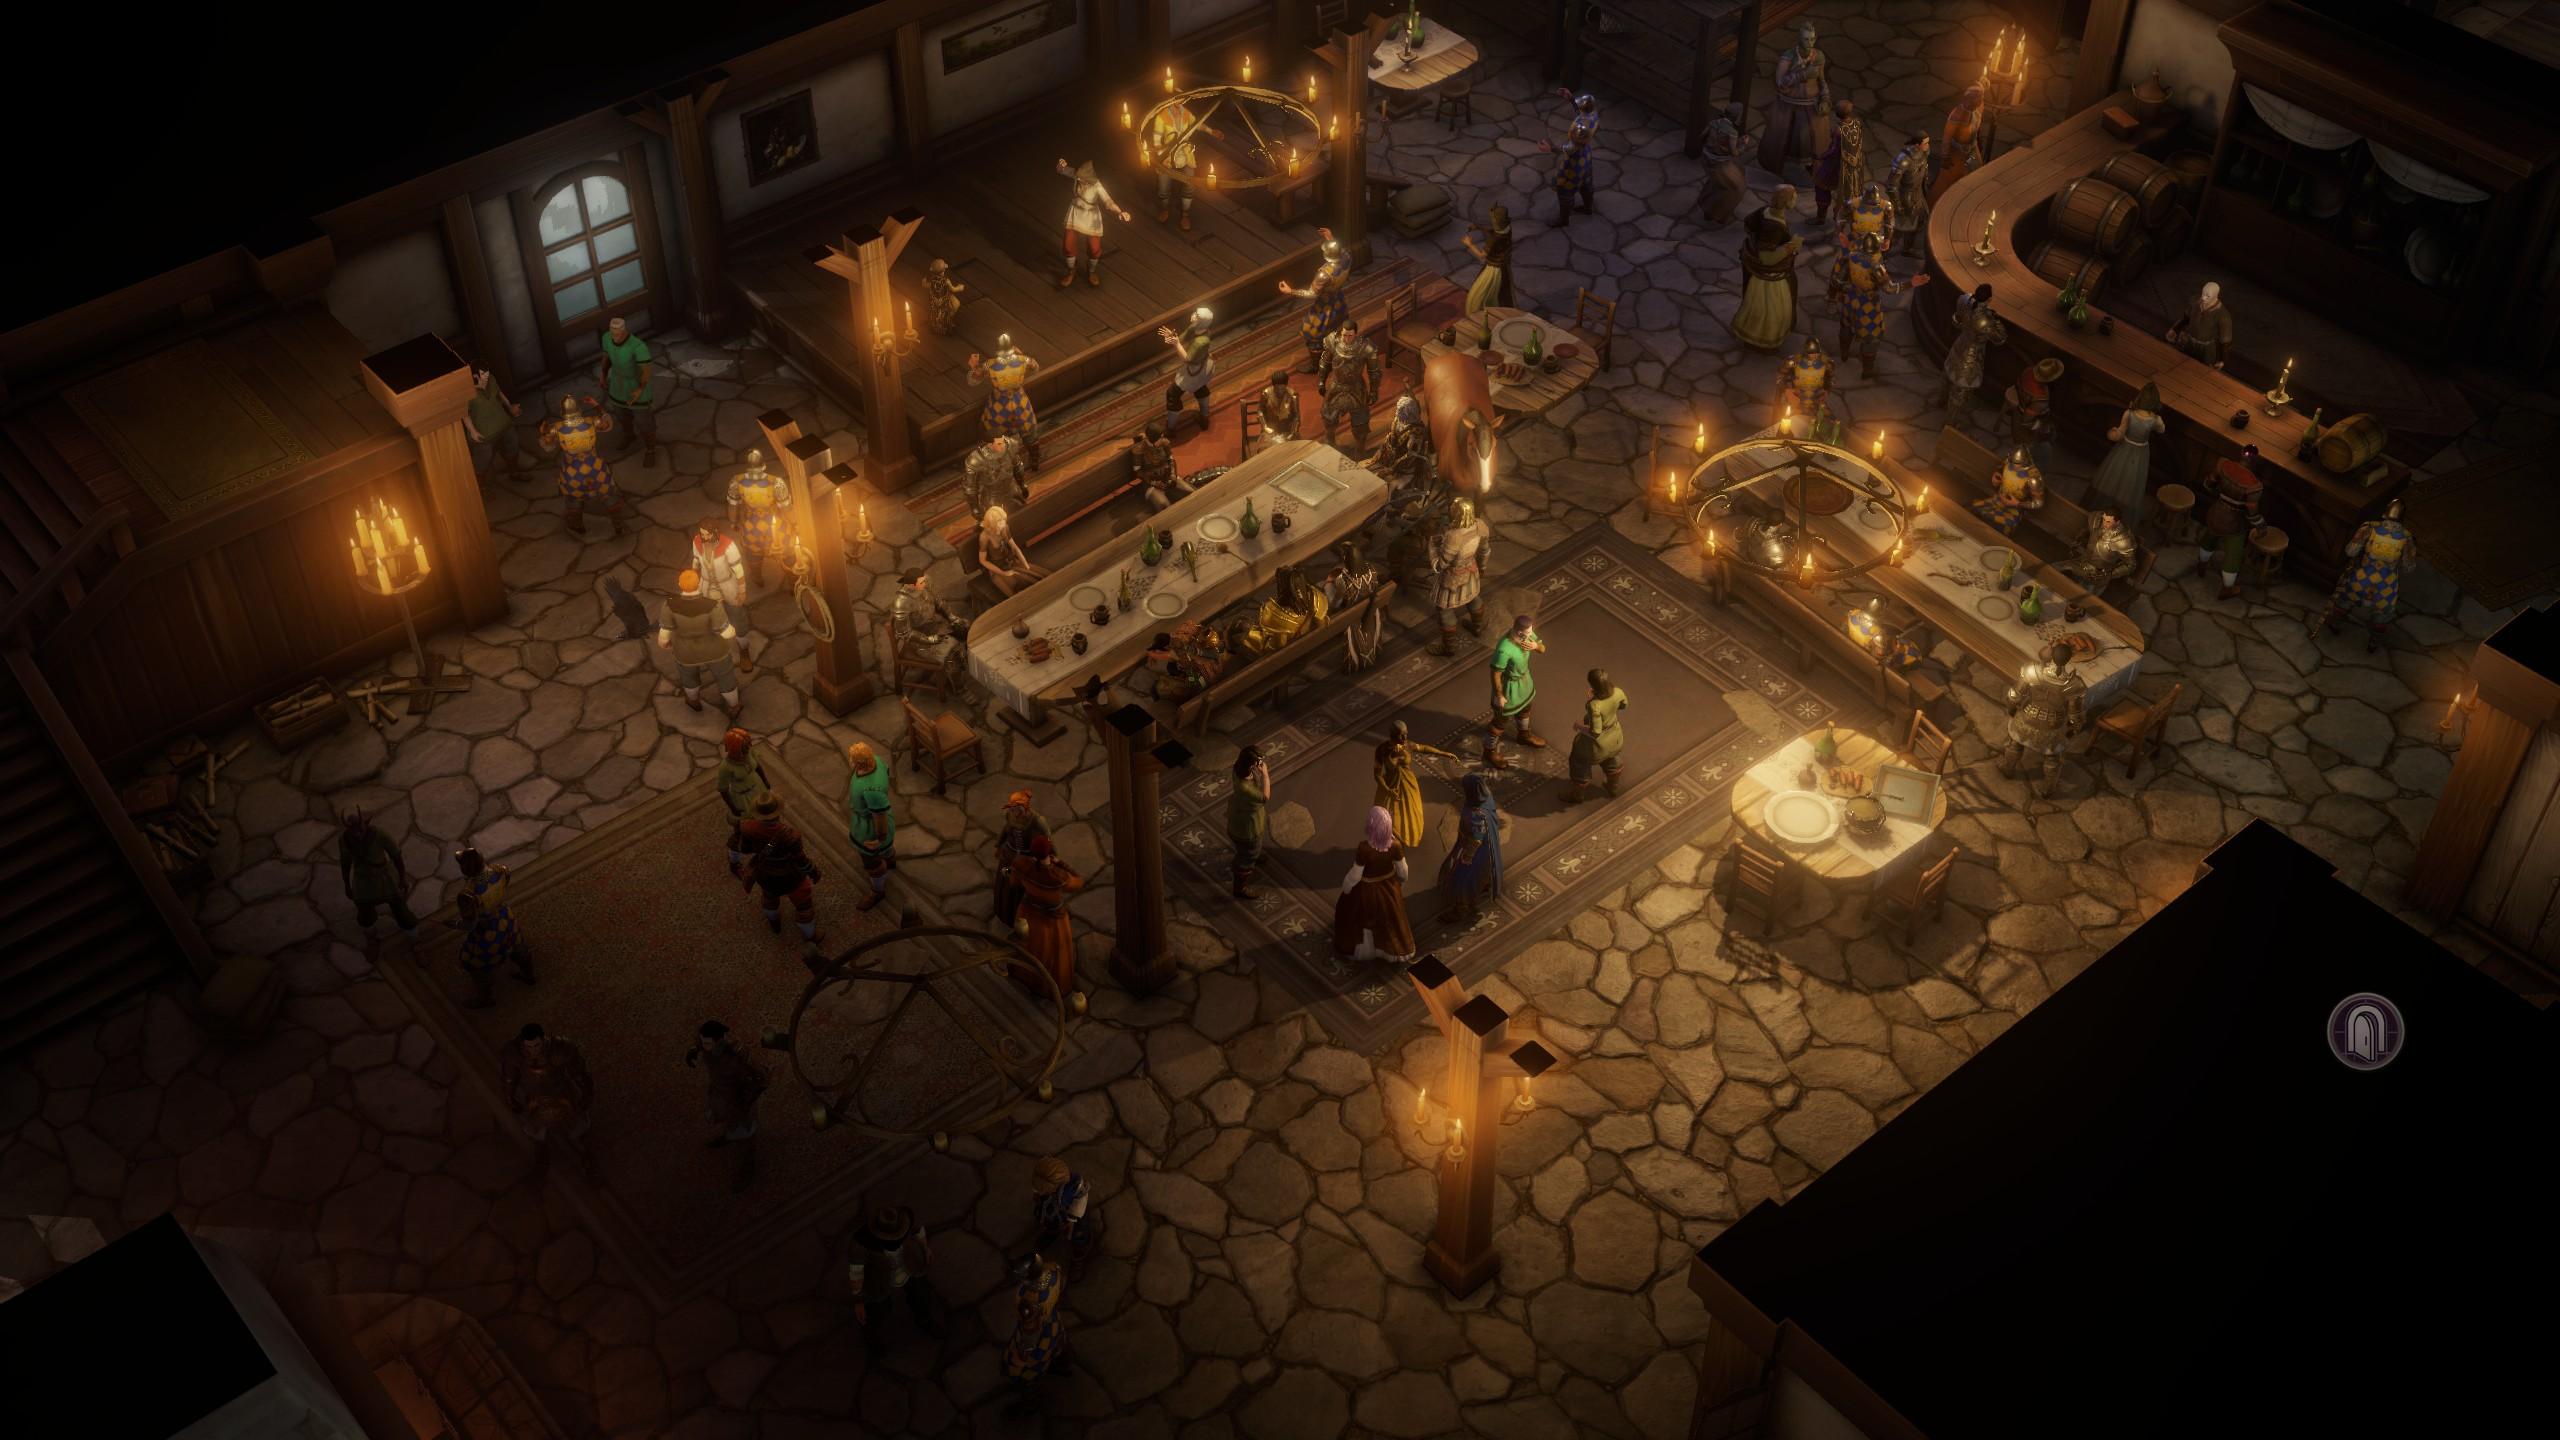 A dimly-lit tavern